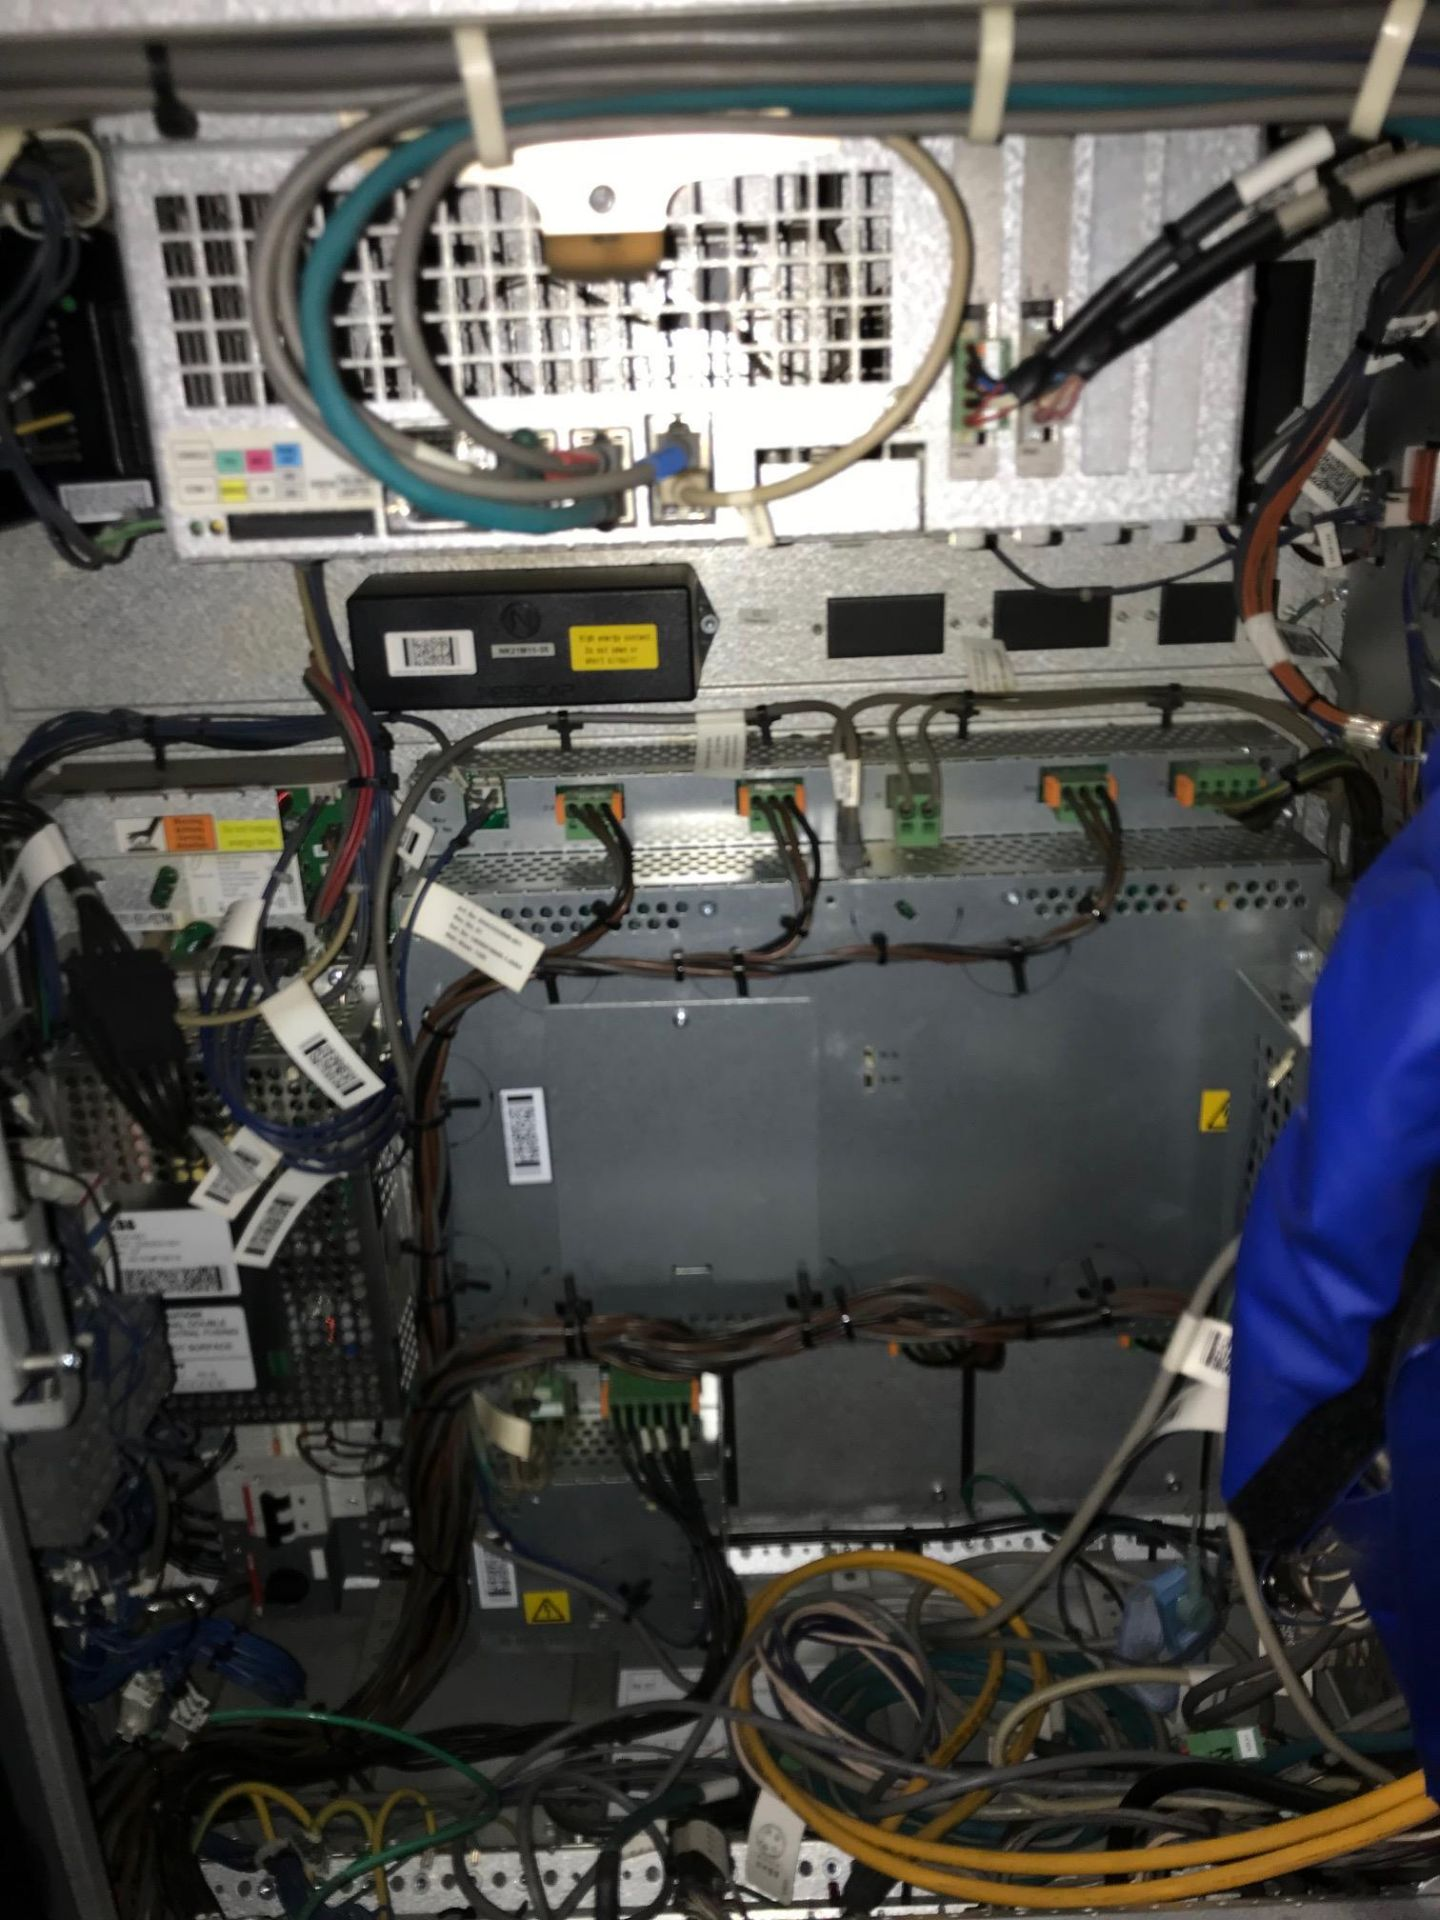 Lot 7 - 2011 - ABB - IRB6640 M2004 235/2.55 - IRC5 Controller